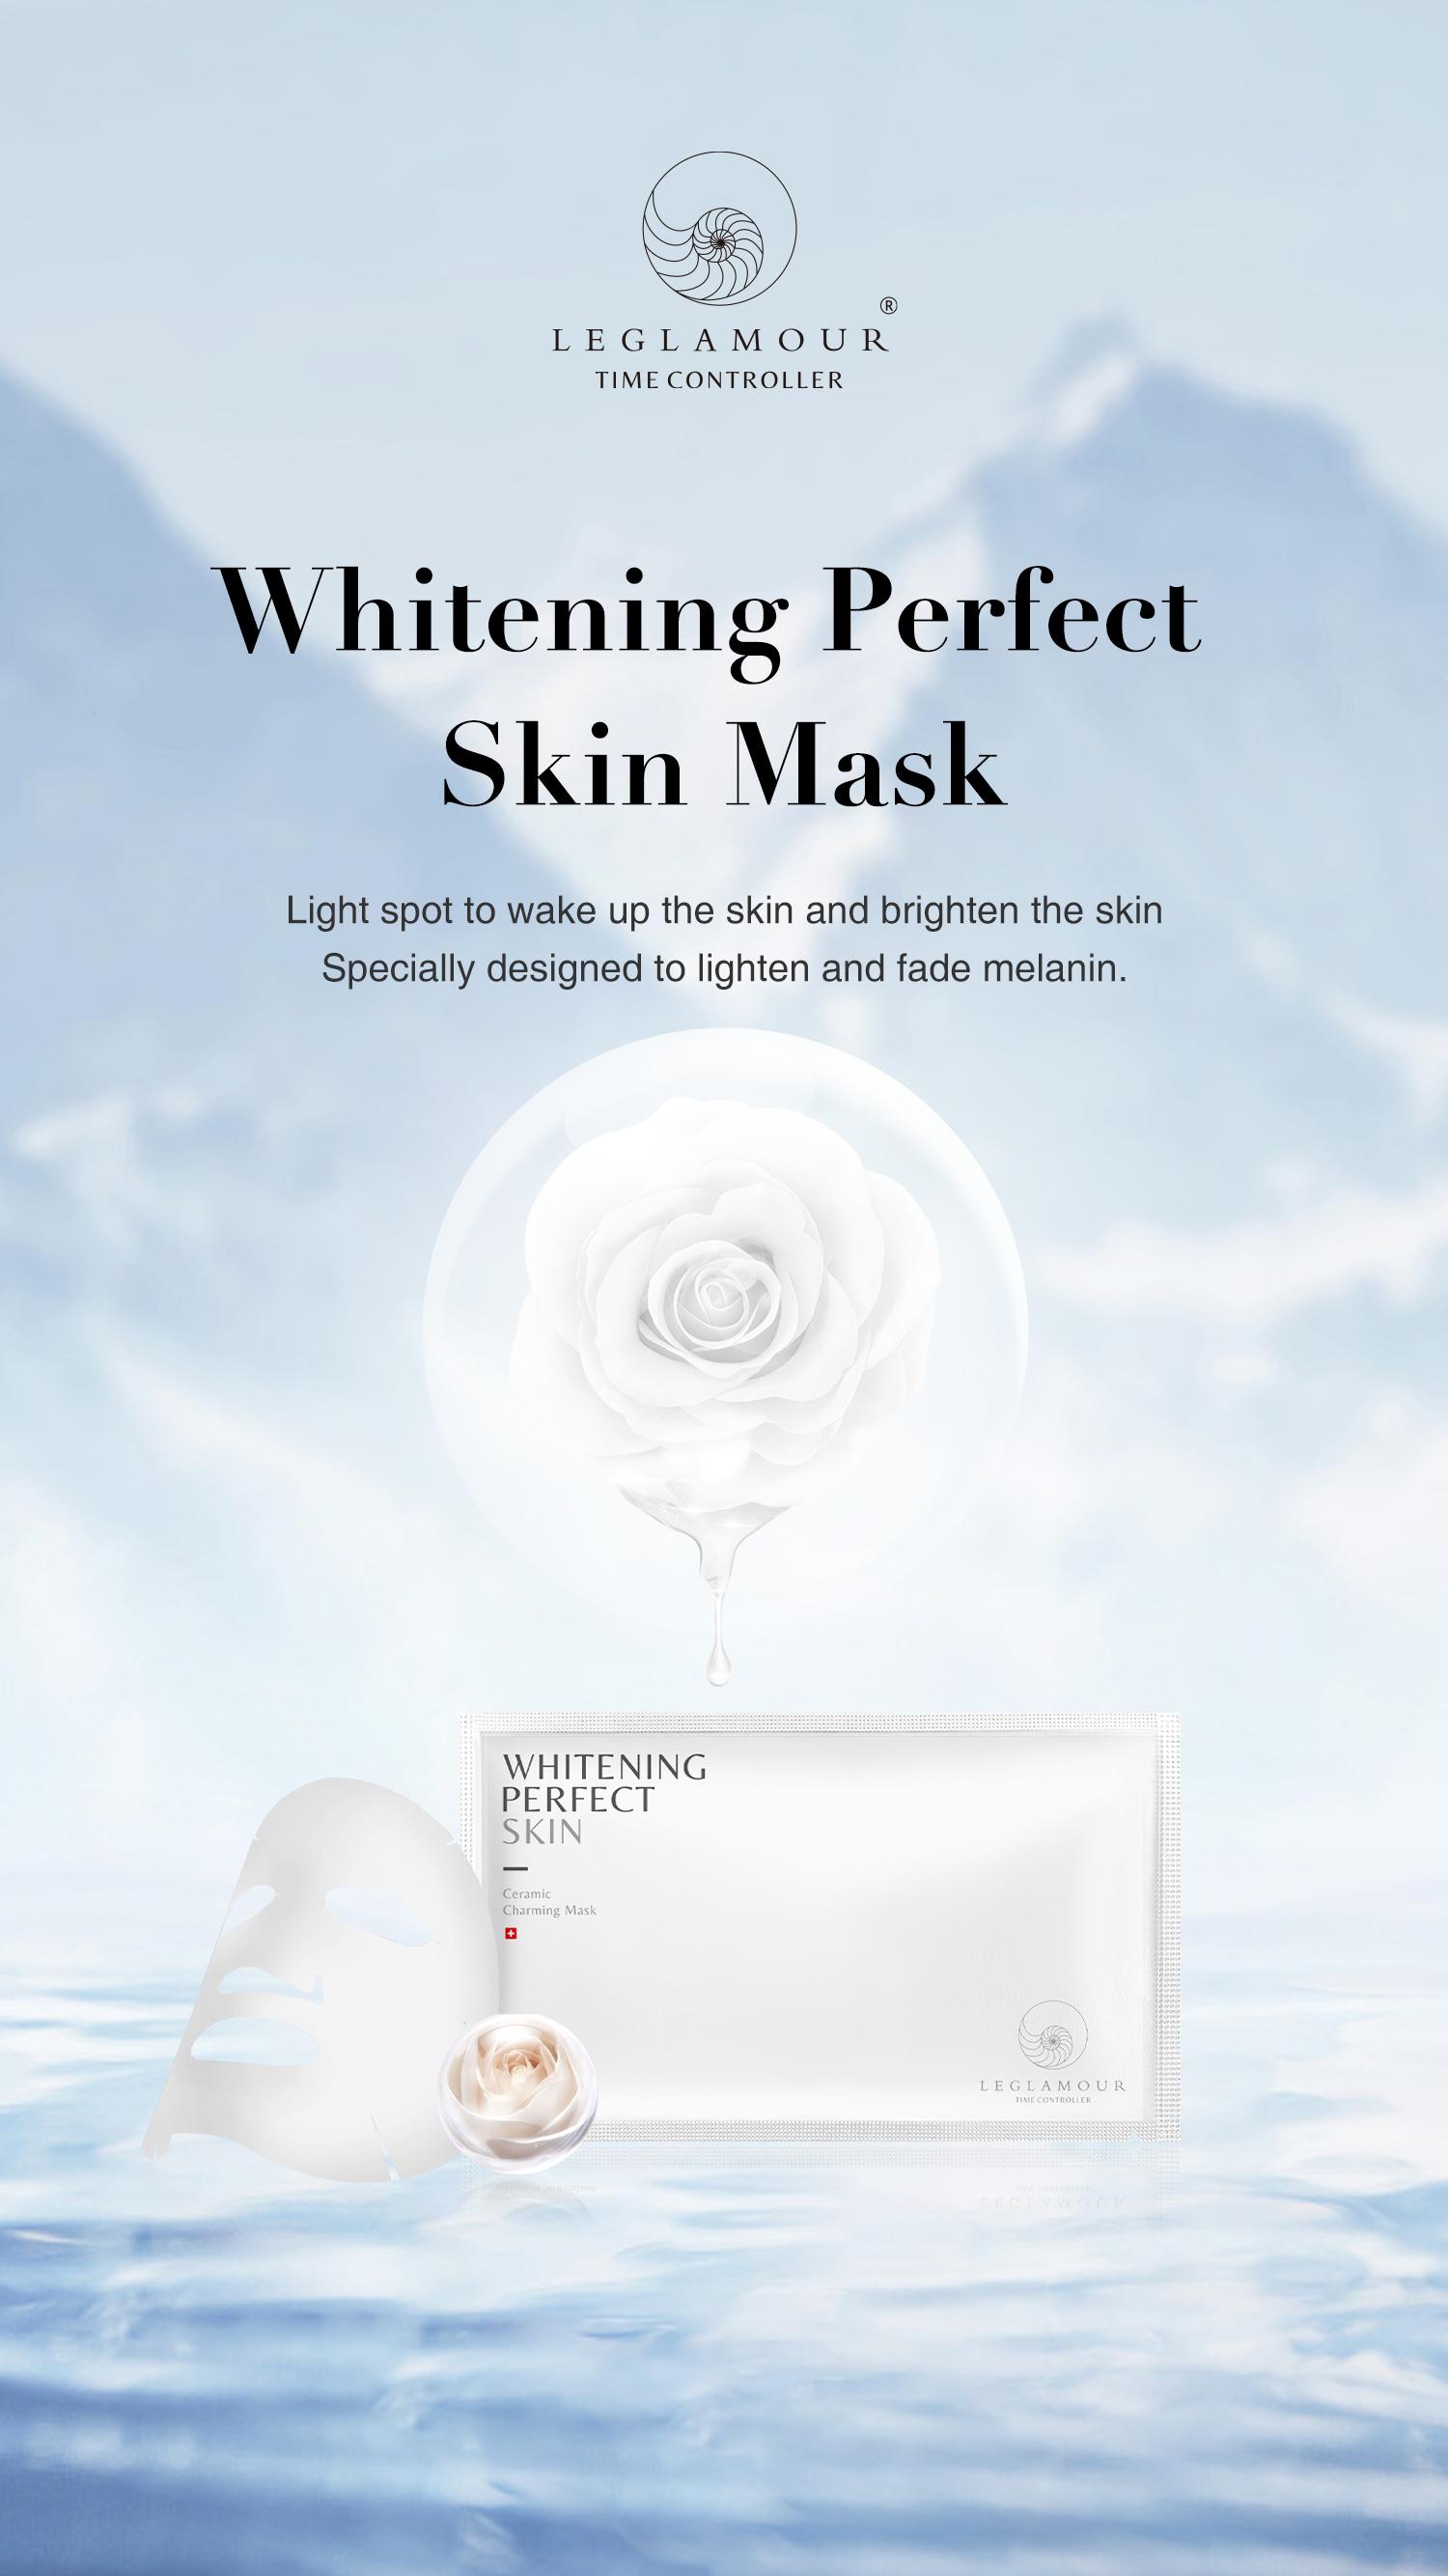 Whiten Perfect Skin Ceramic charming mask (5x25ml)